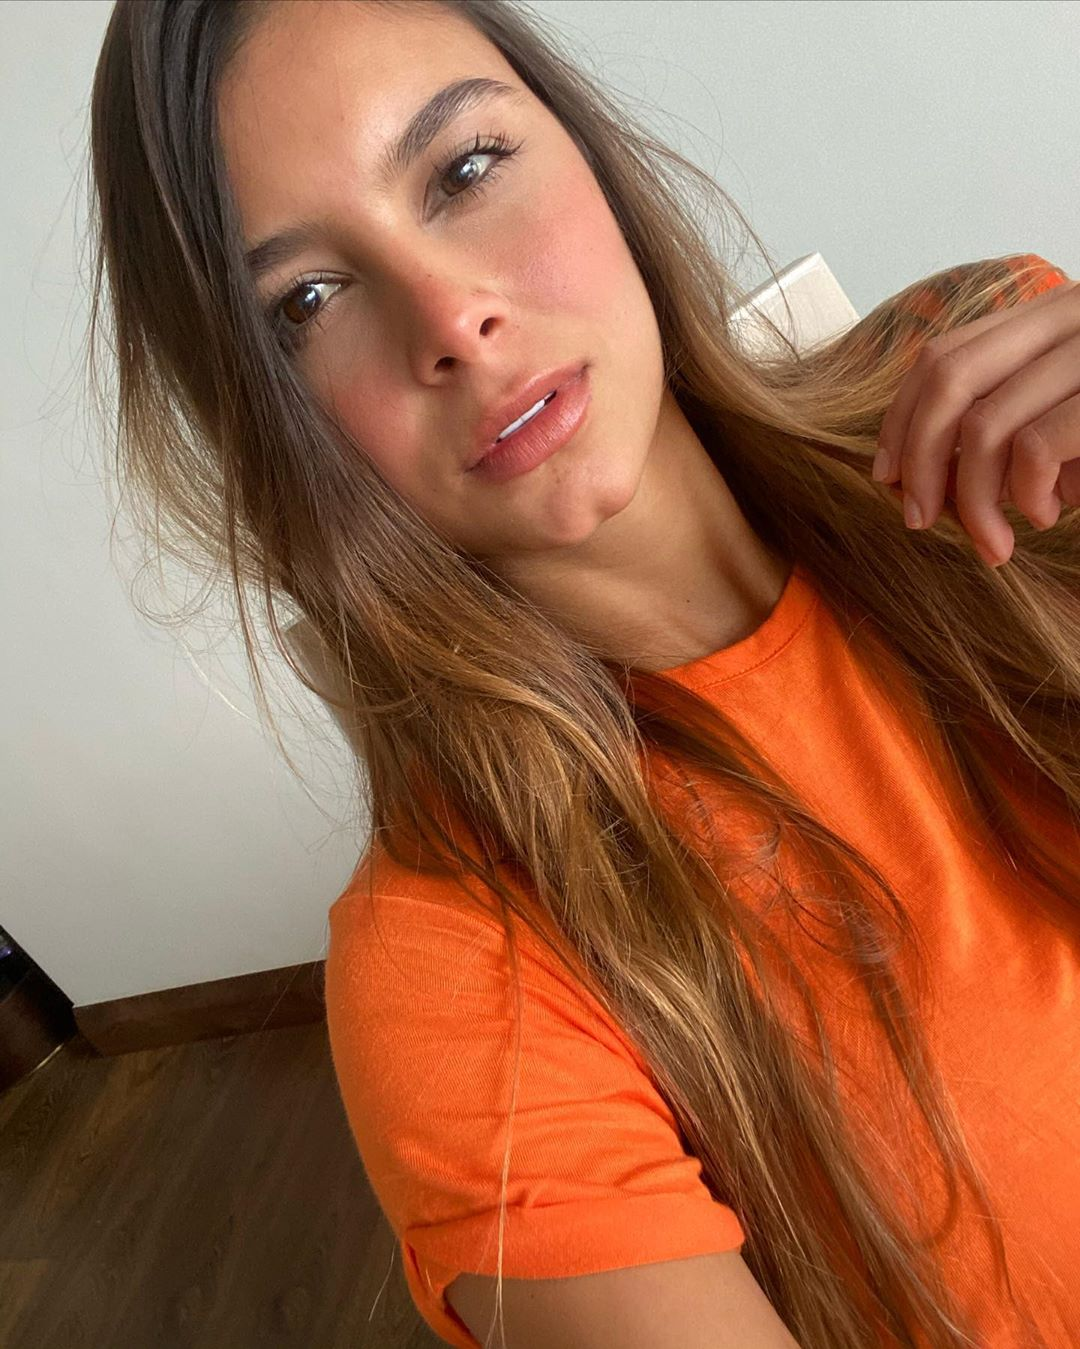 Daniela-Medina-Wallpapers-Insta-FIt-Bio-5